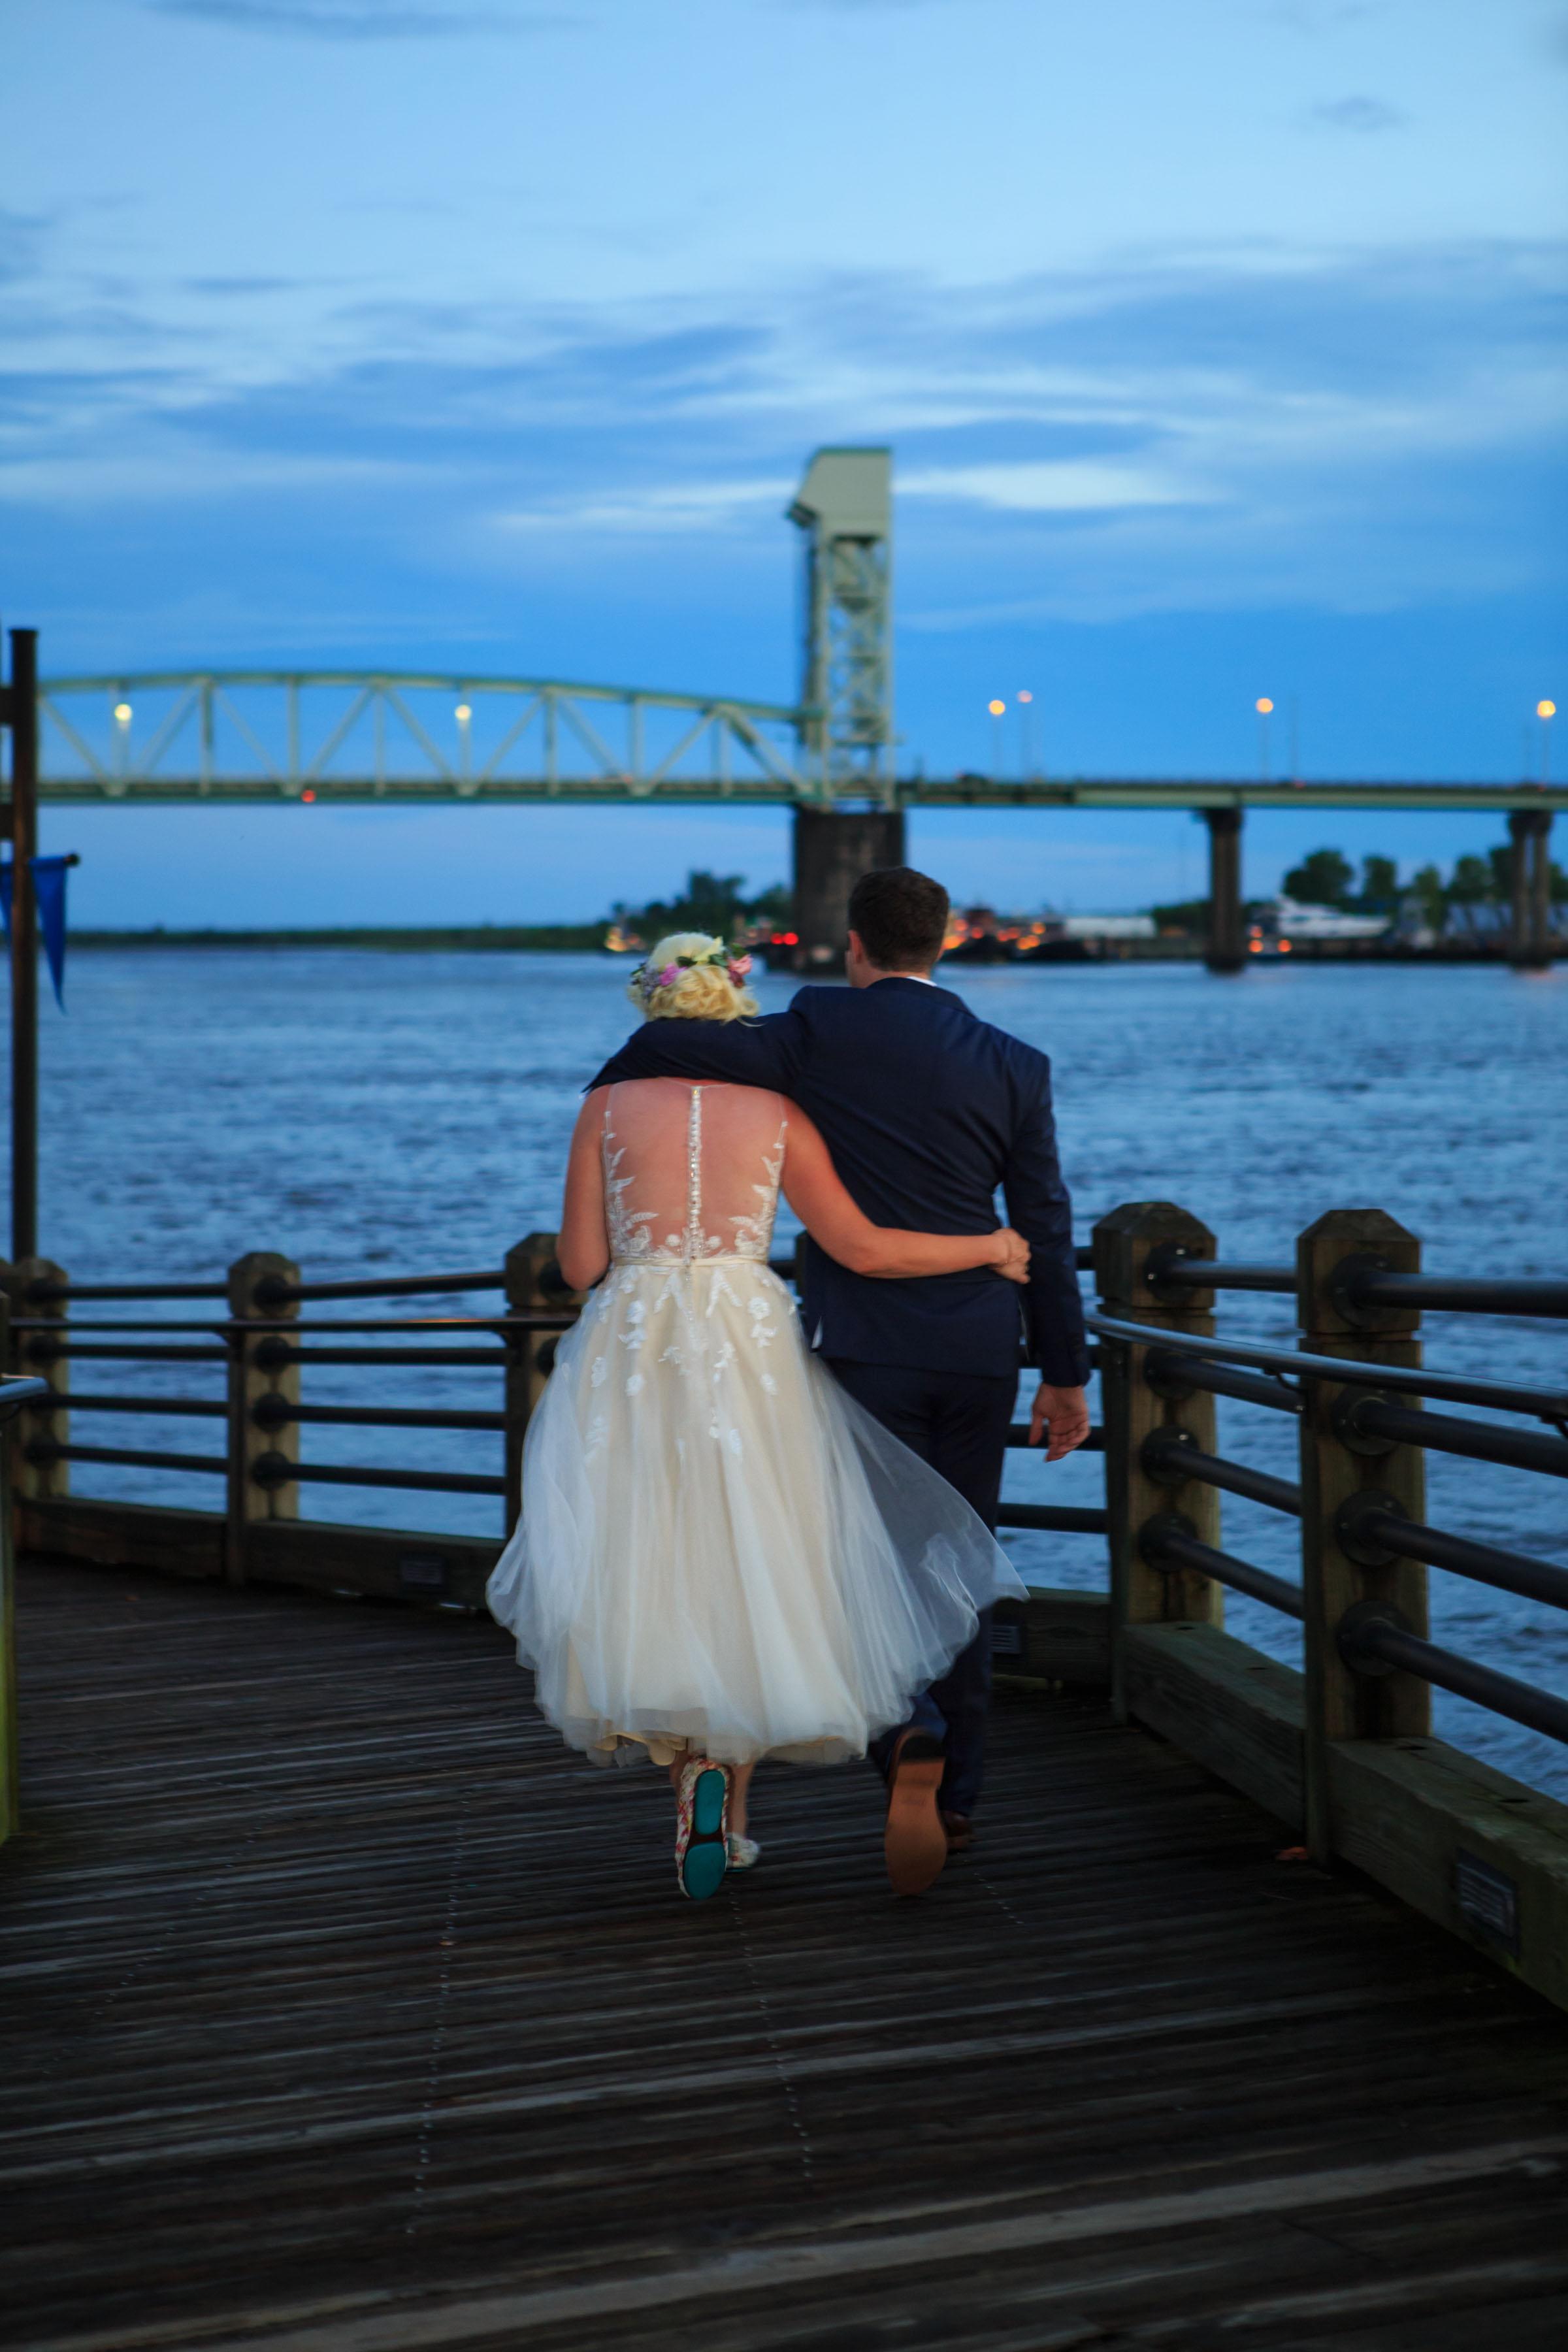 128-South-Wedding-Tiffany-Abruzzo-Photography-Bride-&-Groom-63.jpg